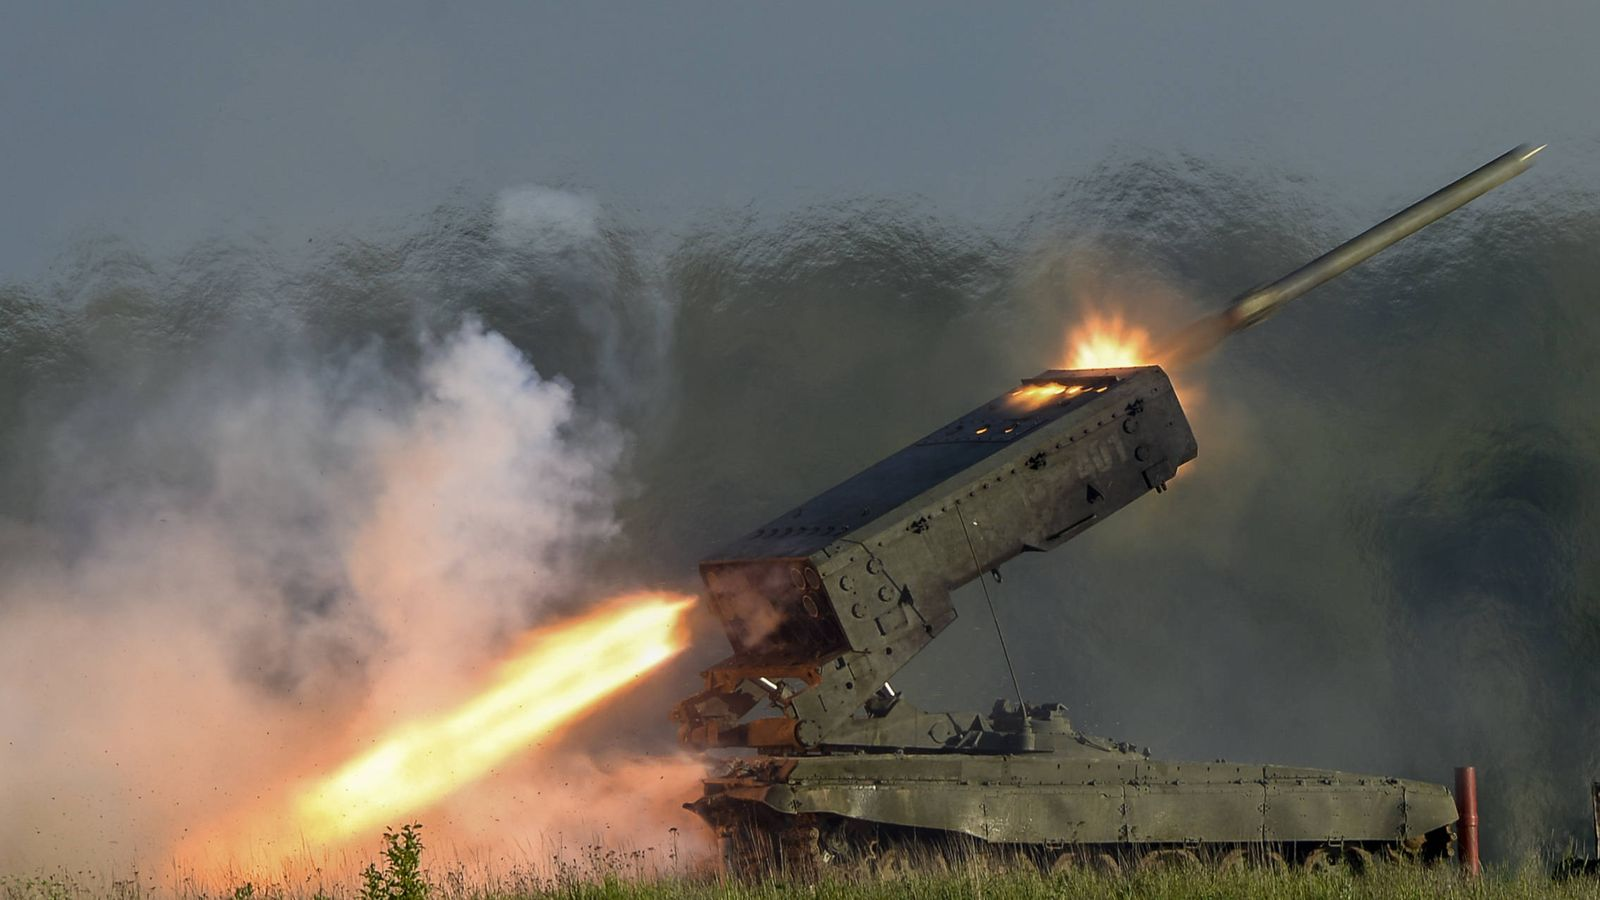 Foto: Los lanzacohetes termobáricos TOS-1A Solntsepyok